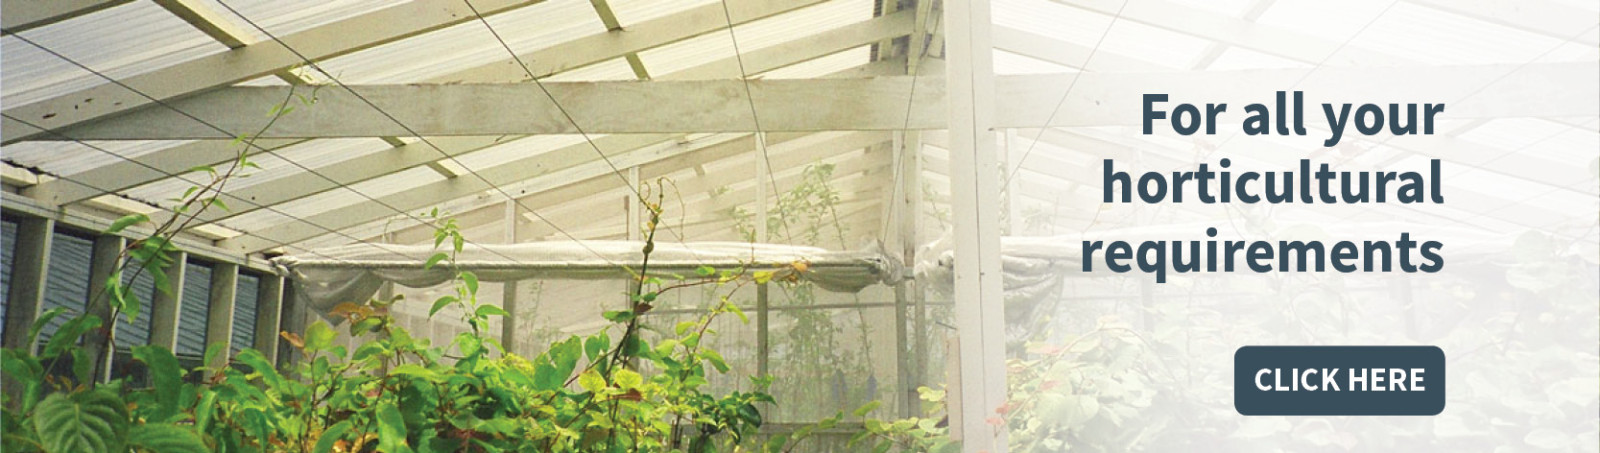 Horticultural 1